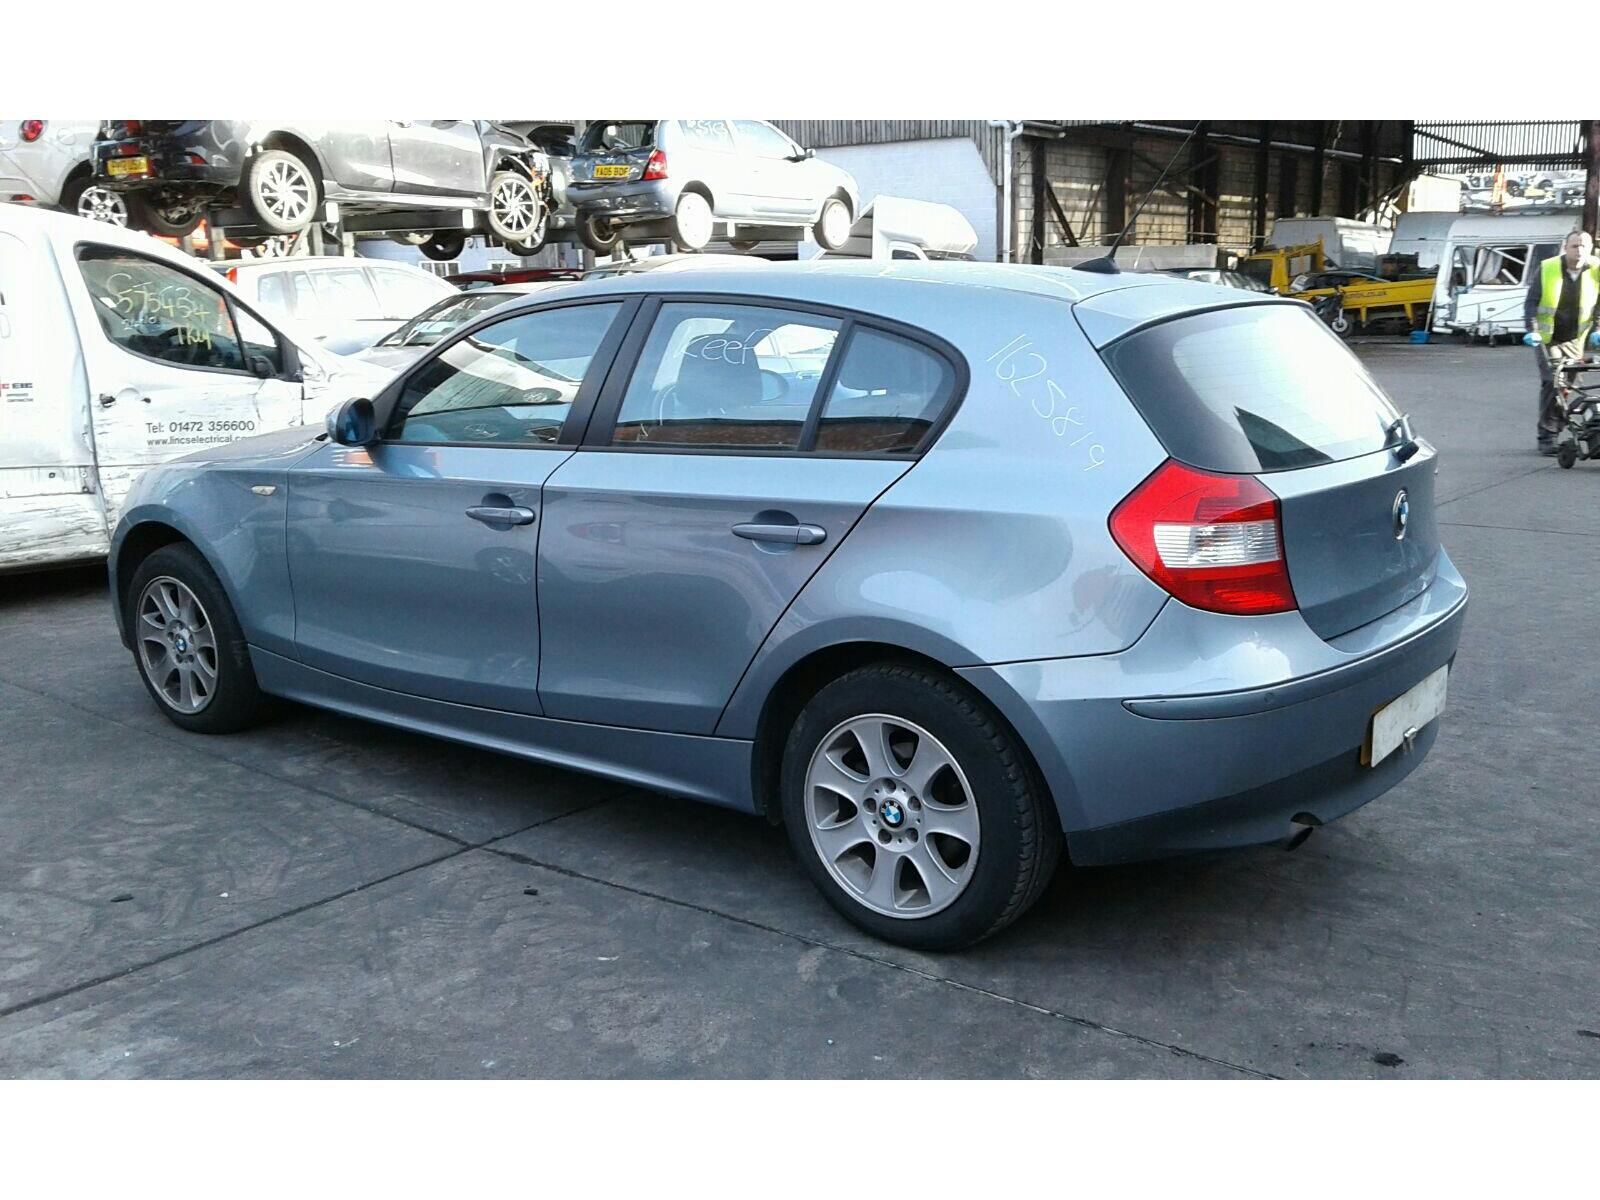 2006 BMW 1 Series 2004 To 2007 5 Door Hatchback (Petrol / Manual ...